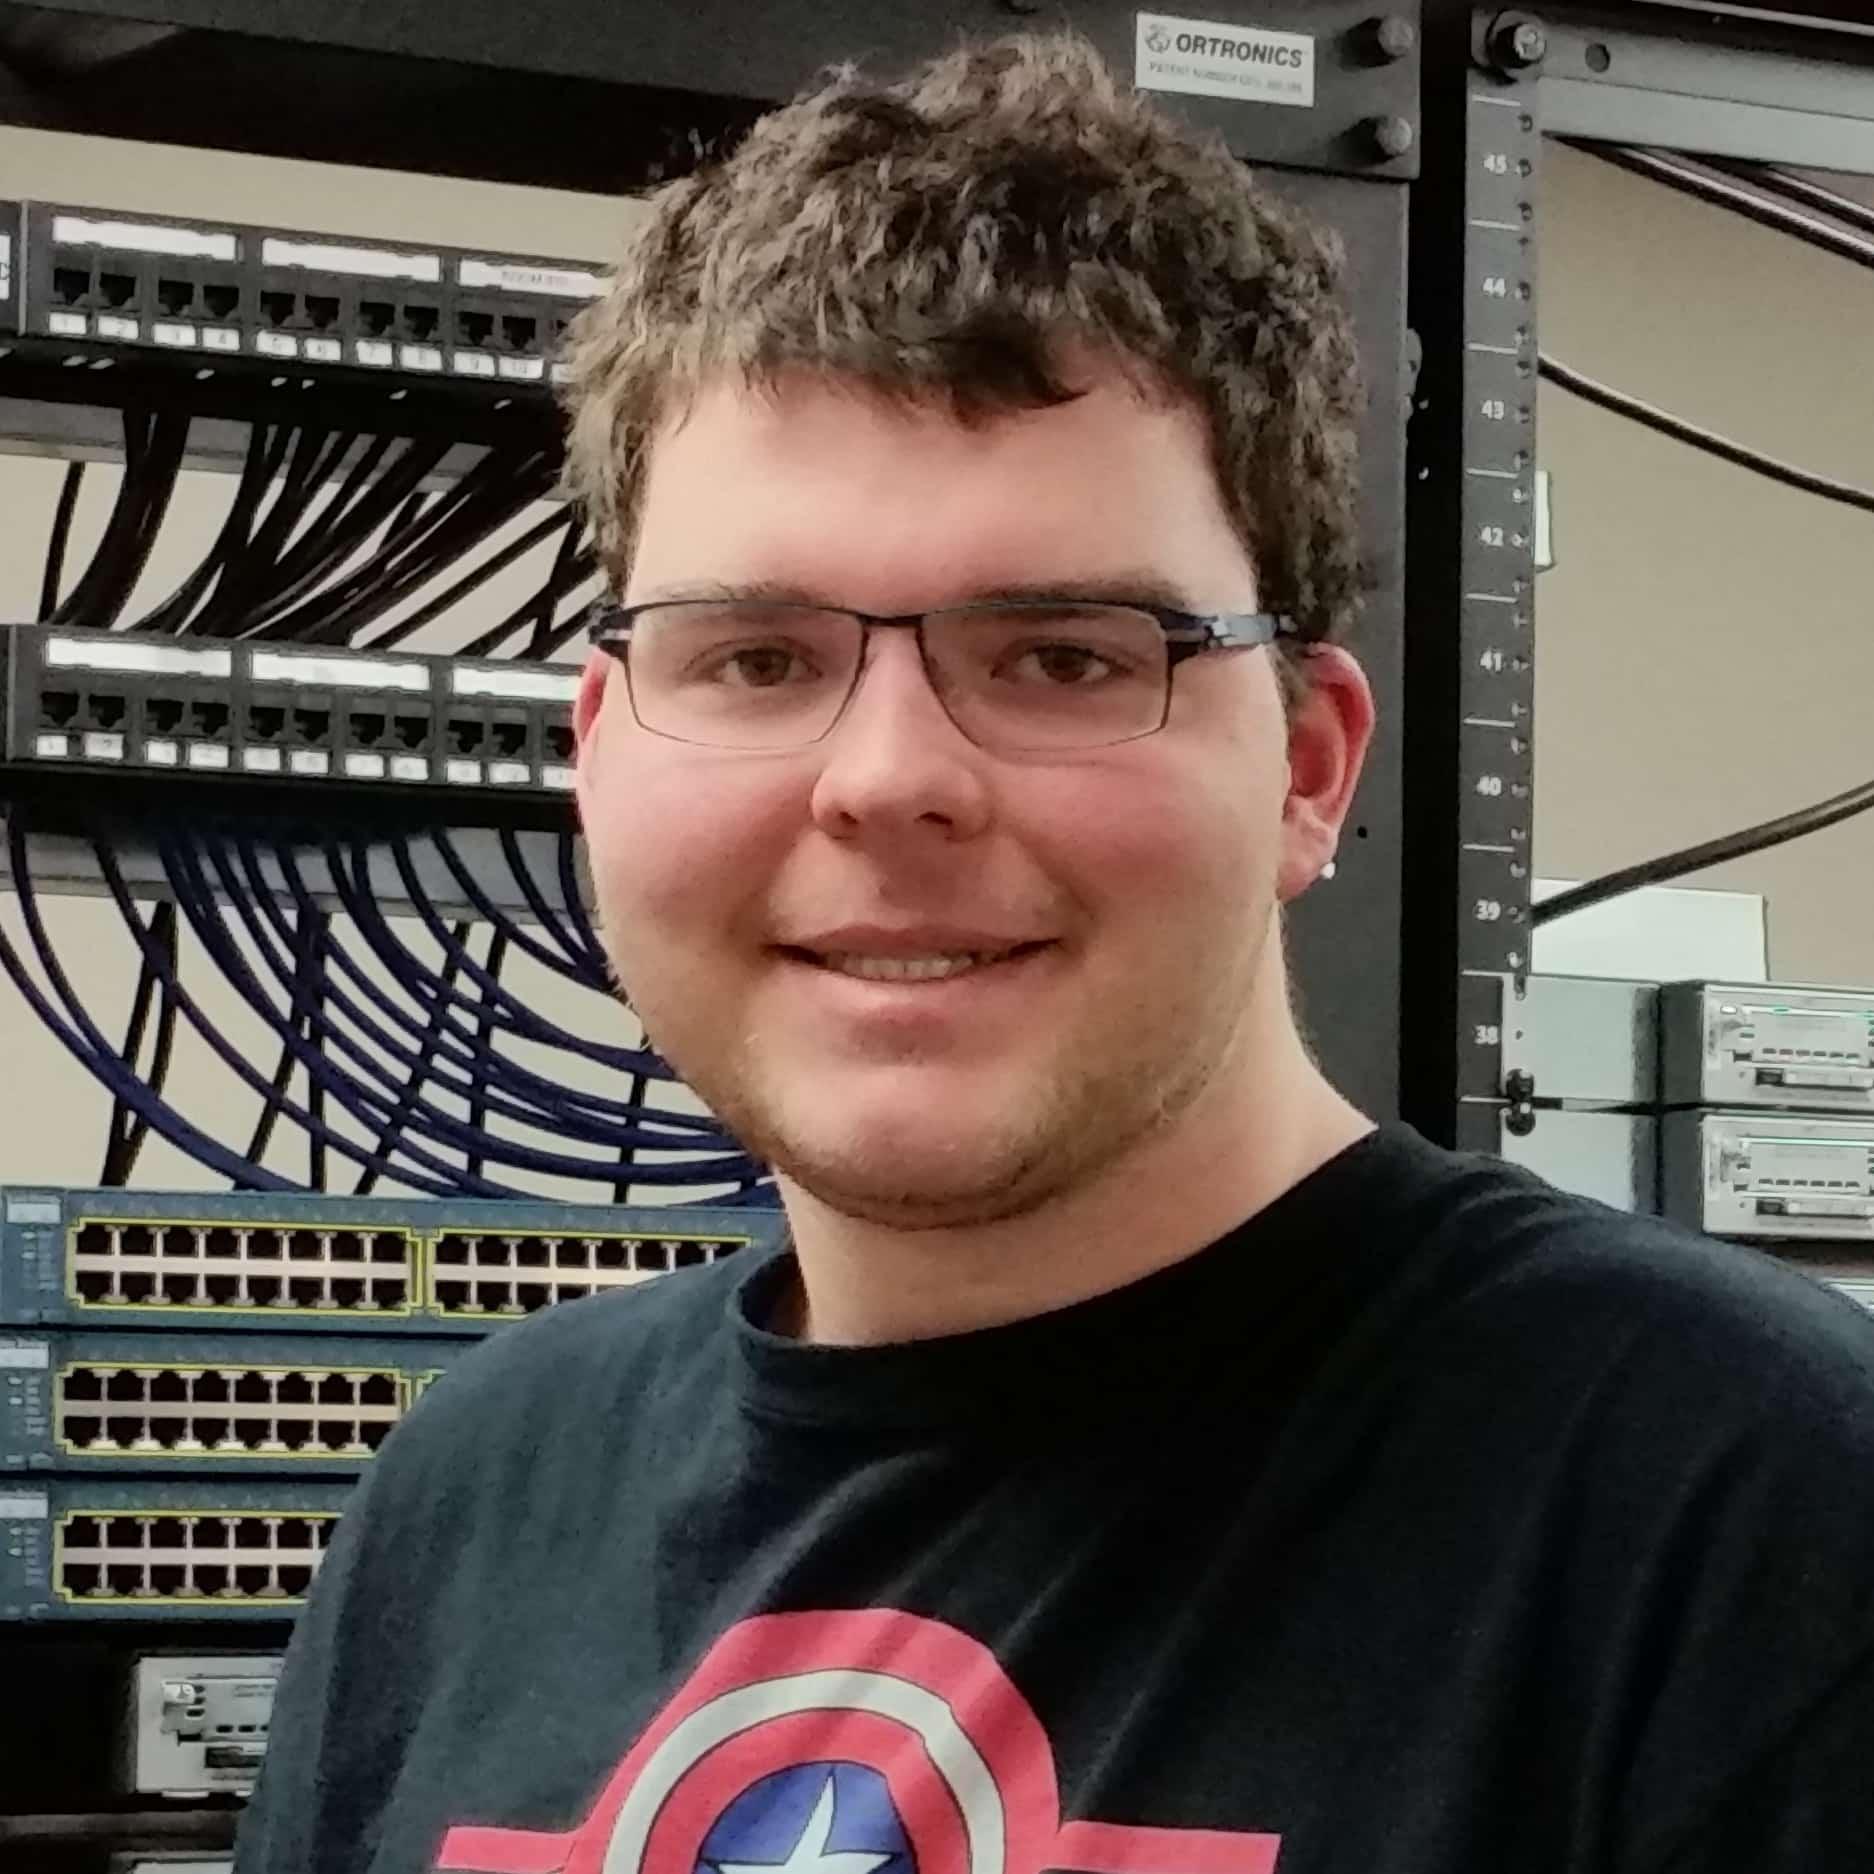 Tom Weening, student, smiles